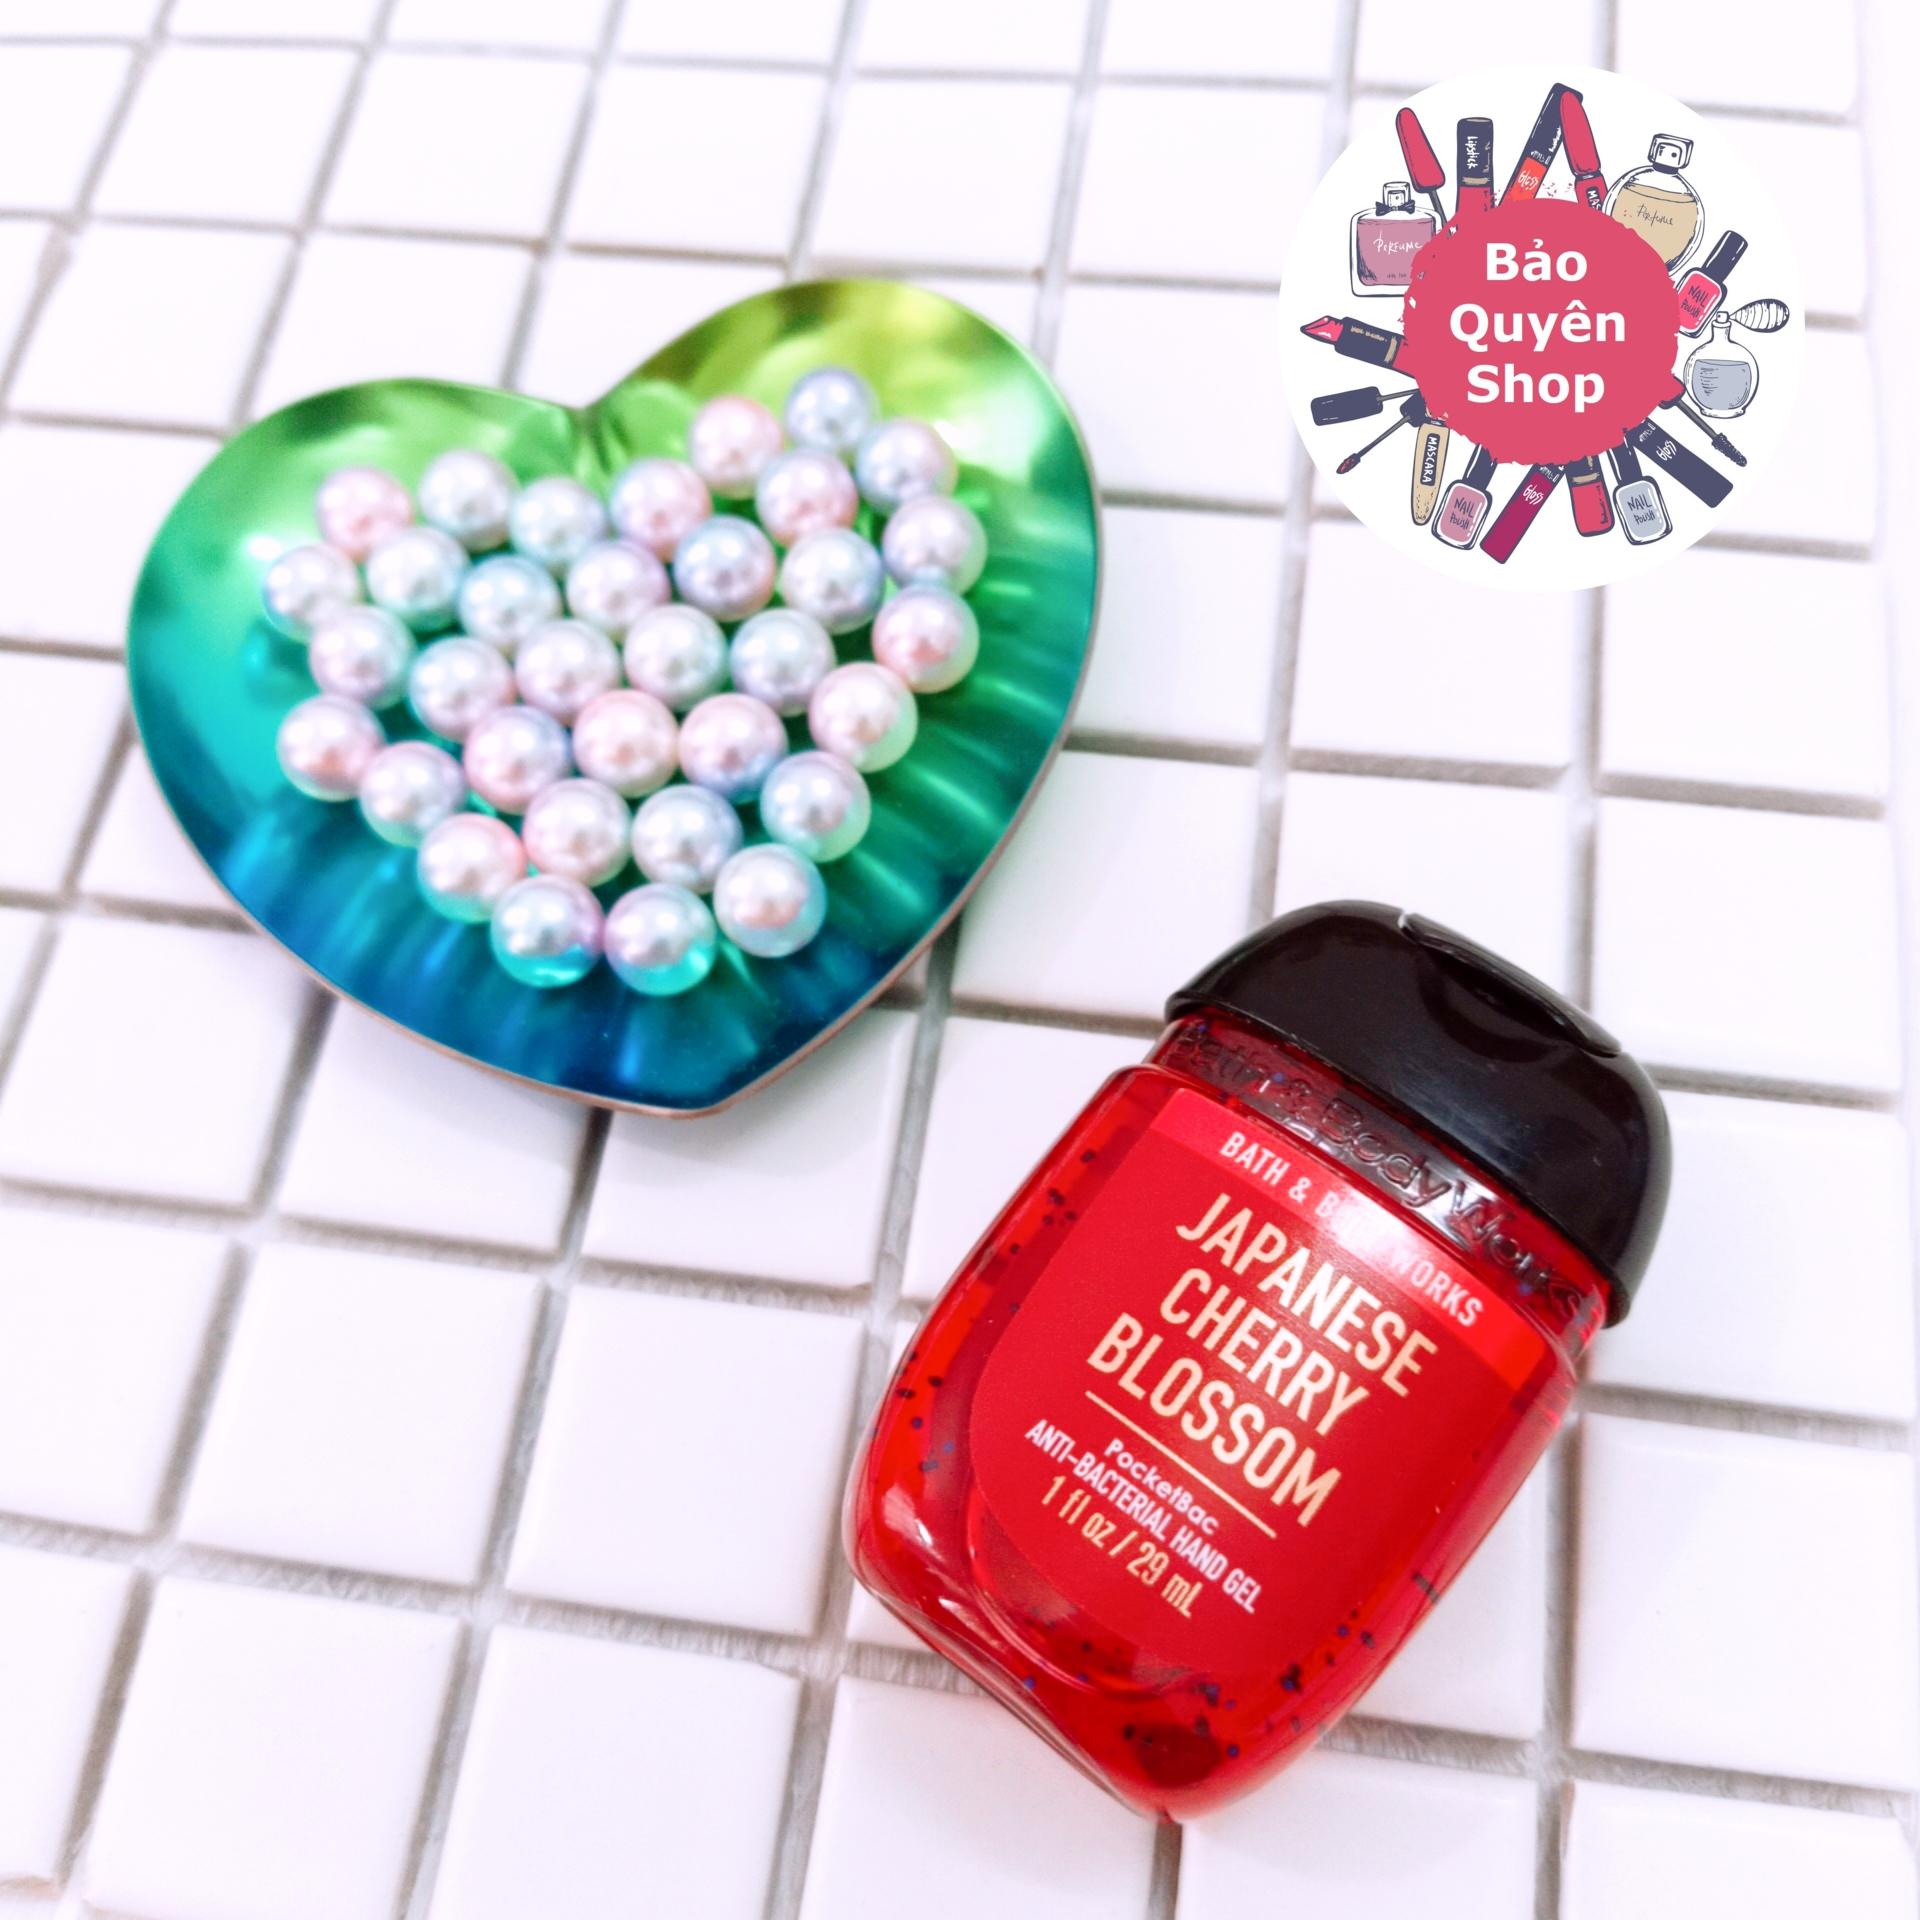 Gel rửa tay khô mini Bath & Body Works - Japanese Cherry Blossom - PocketBac Anti-bacterial Hand Gel 29mL